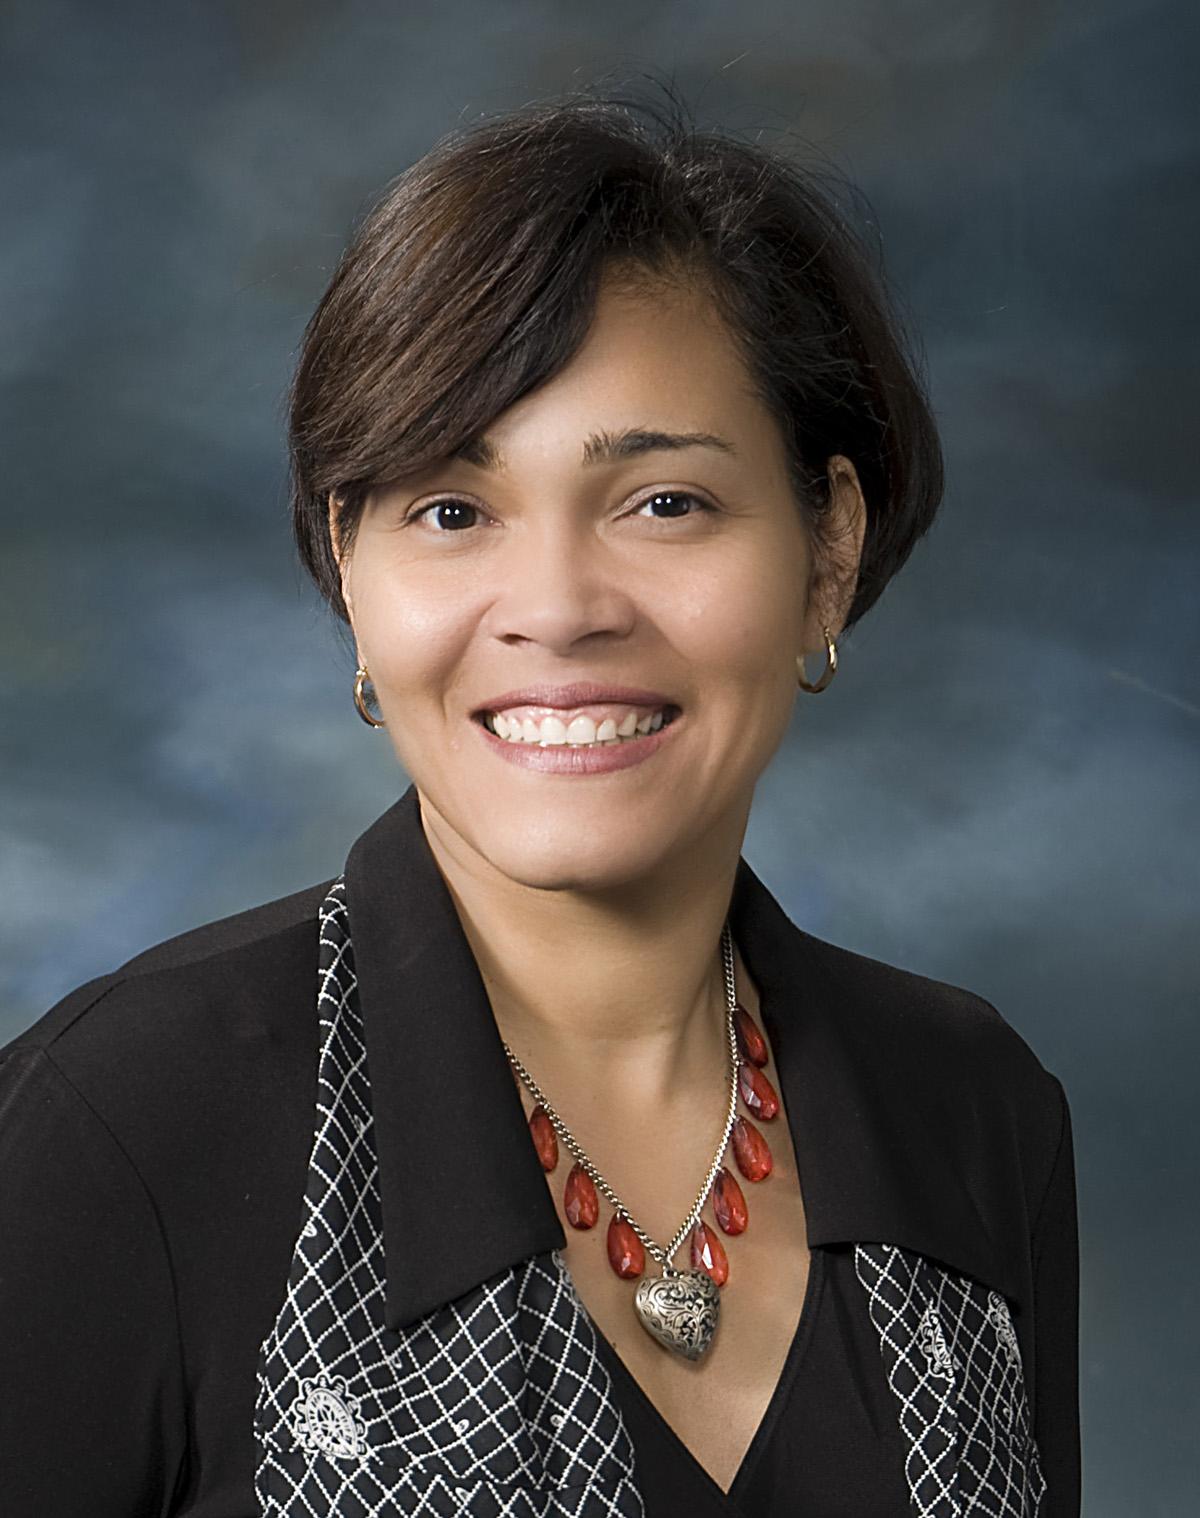 Lydia Diaz